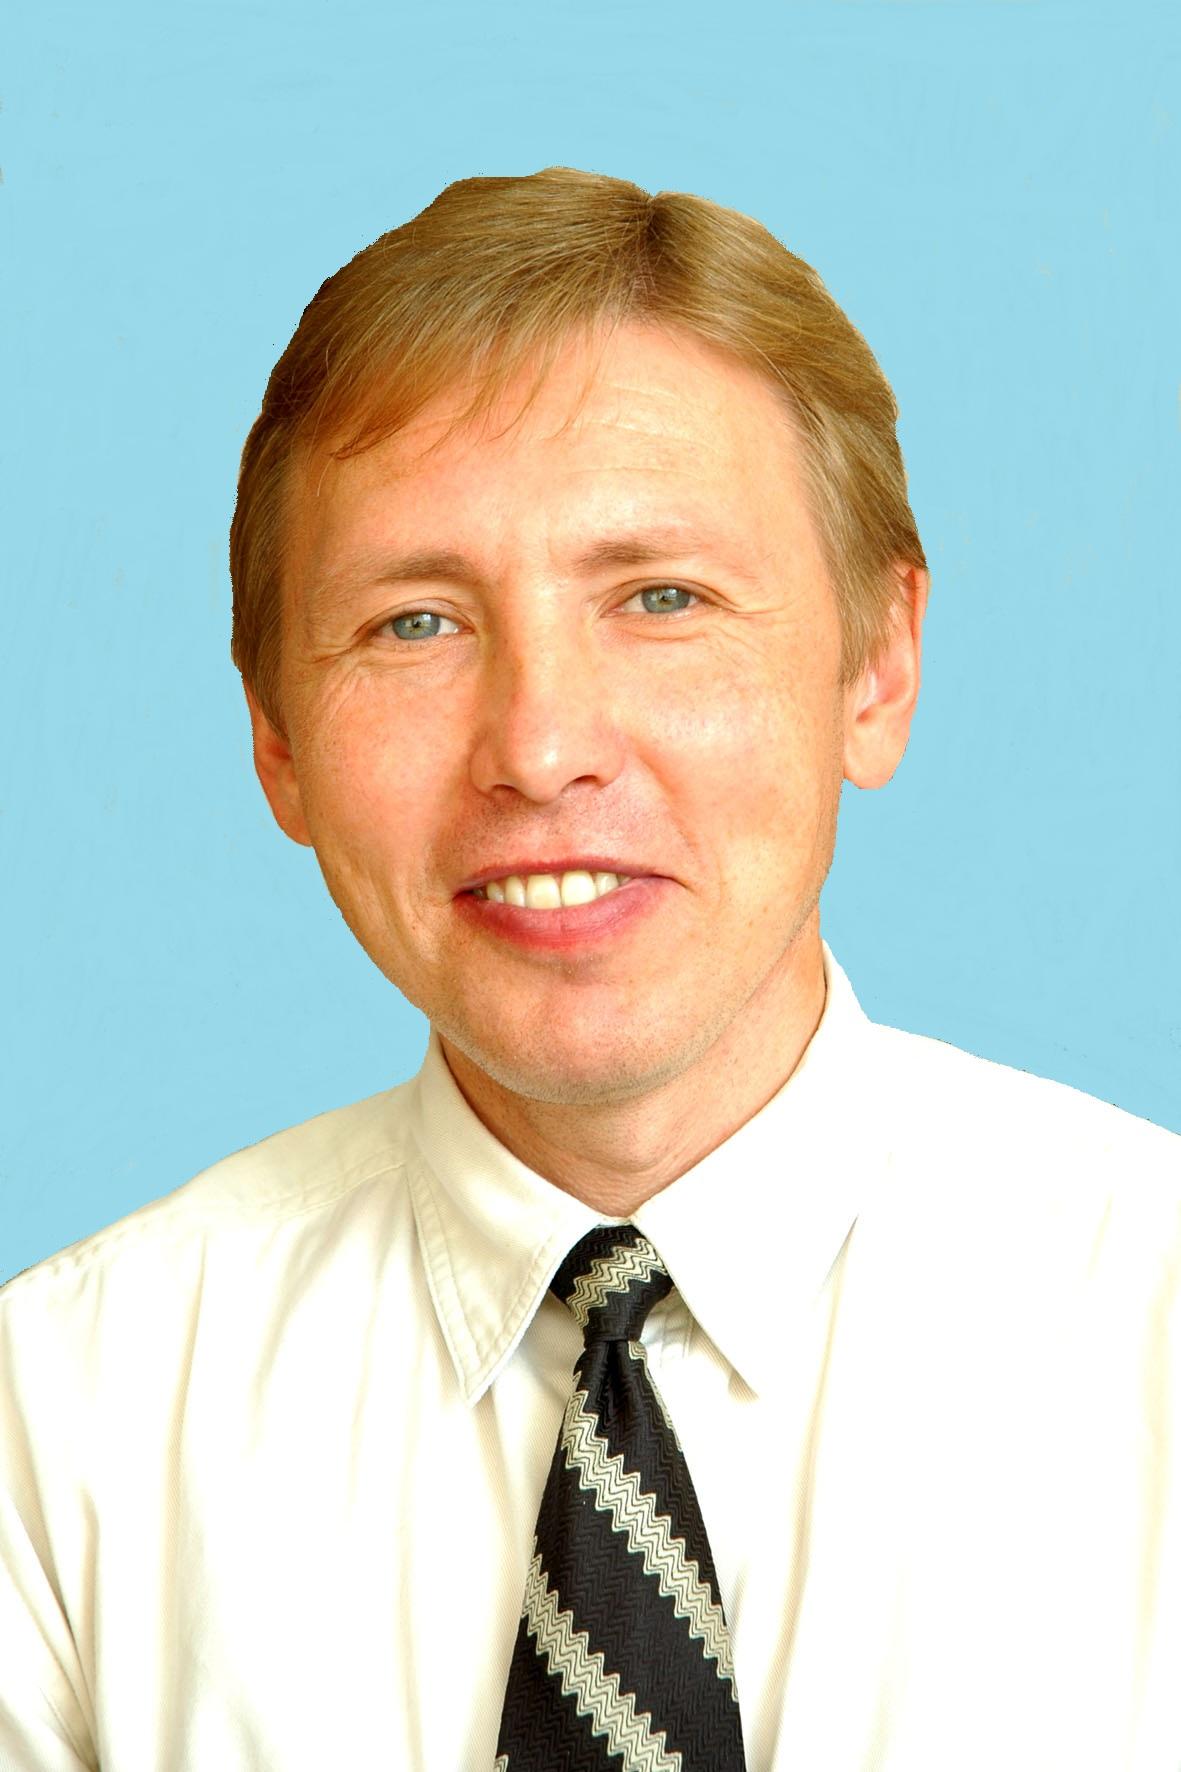 Киселев Сергей Юрьевич